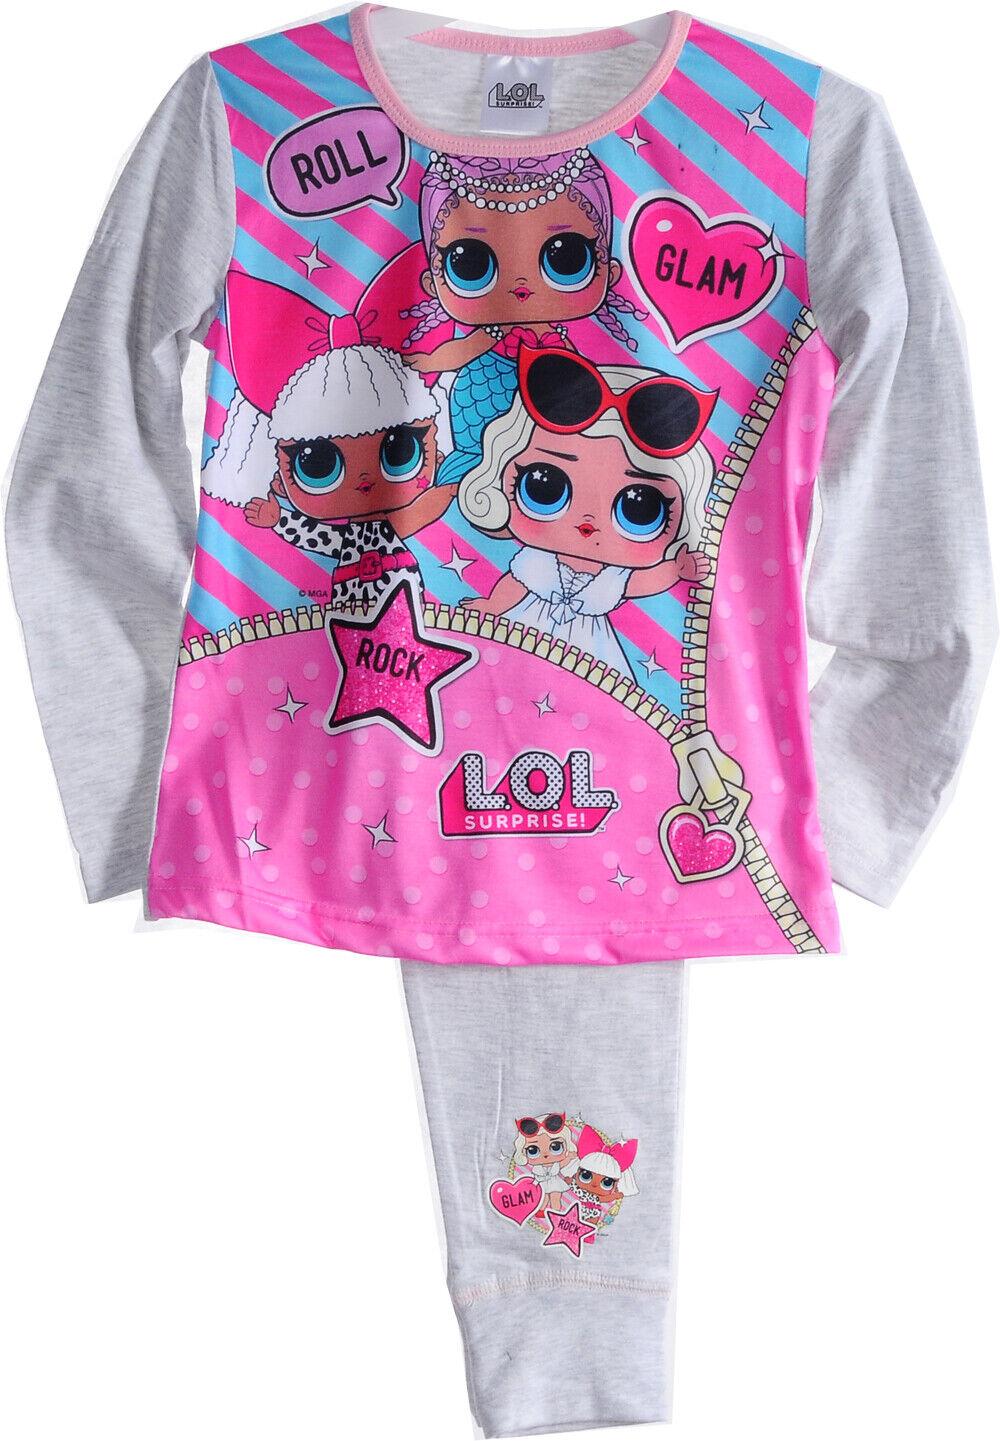 LOL Surprise Kinder Pyjama SET SCHLAFANZUG Hose Shirt 110 116 122 128 134 140